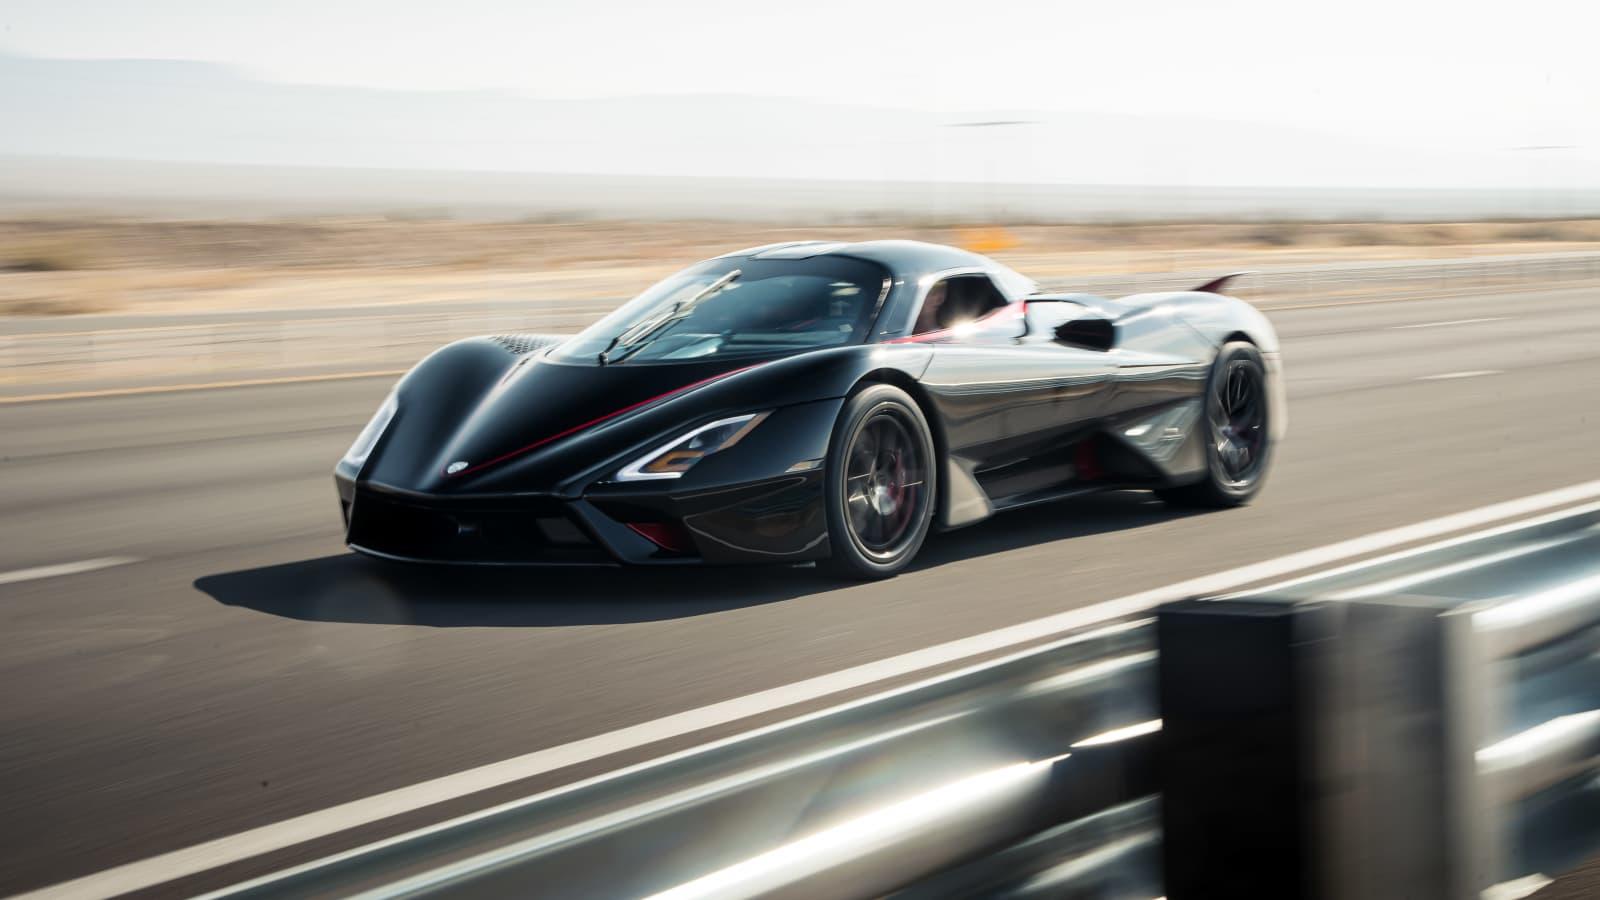 The Ssc Tuatara Is Now The World S Fastest Car 316 Mph Photos